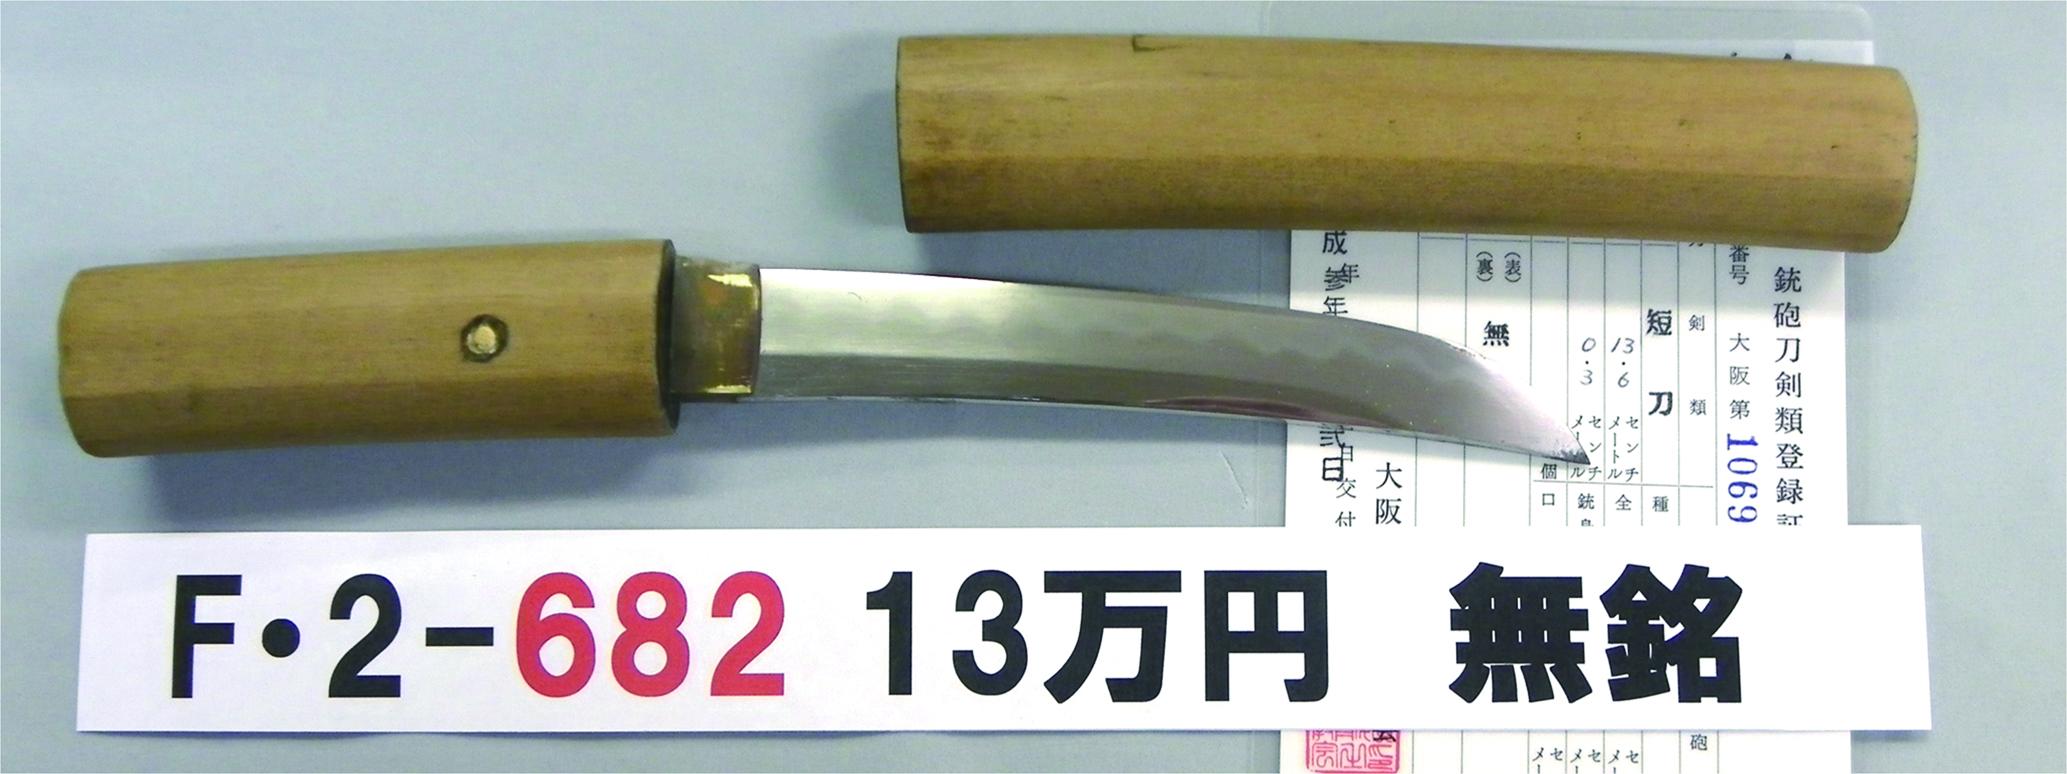 F2682